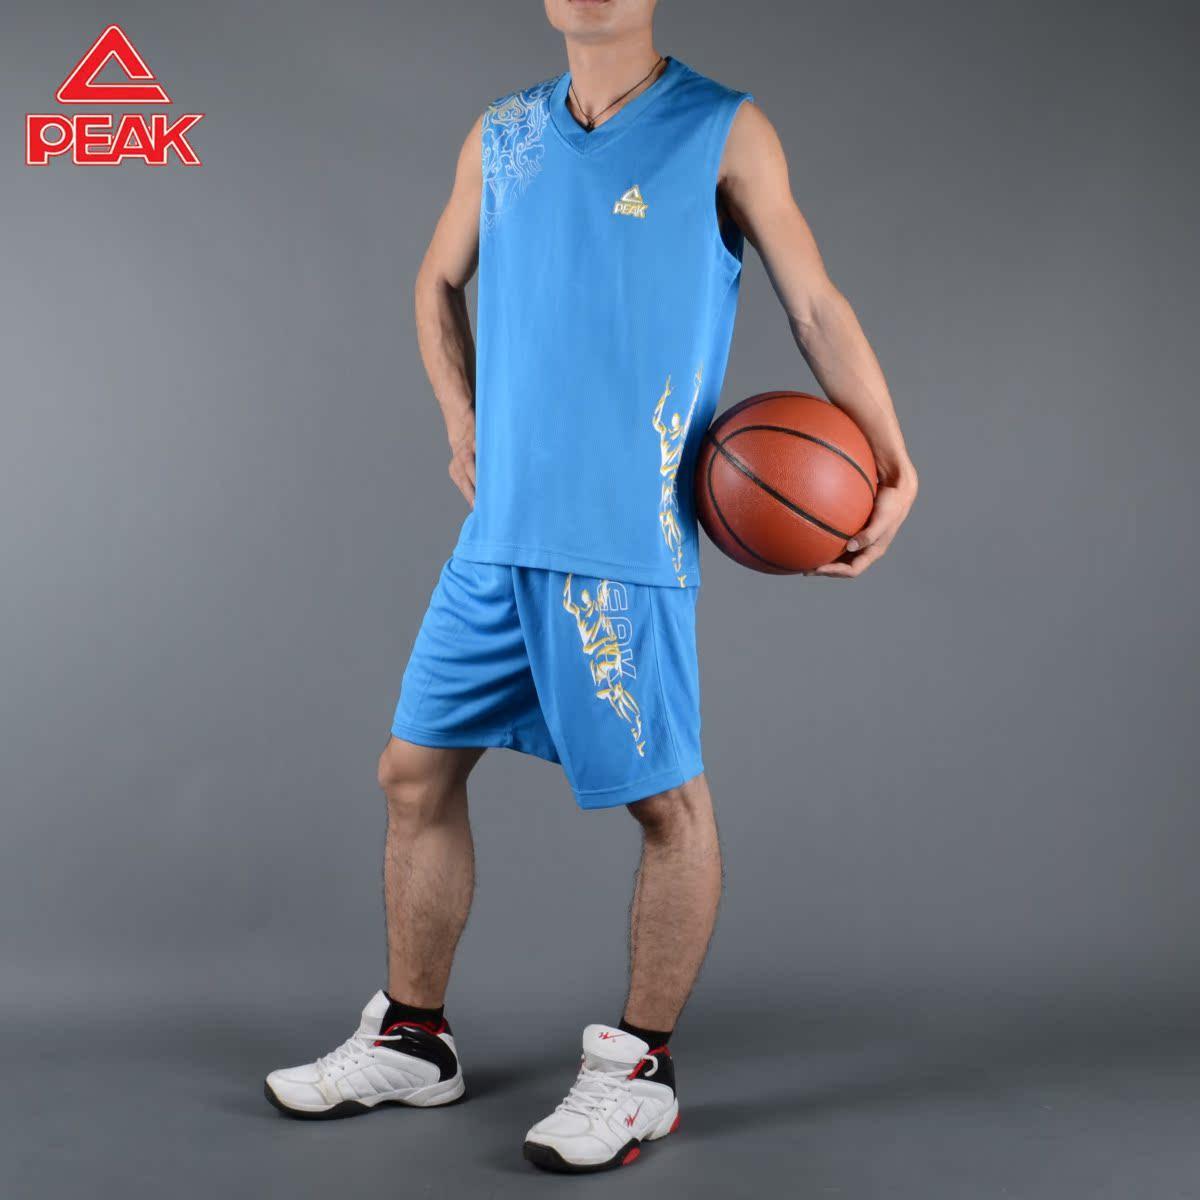 одежда для занятий баскетболом Peak 09 Костюм баскетбол одежды Муж.